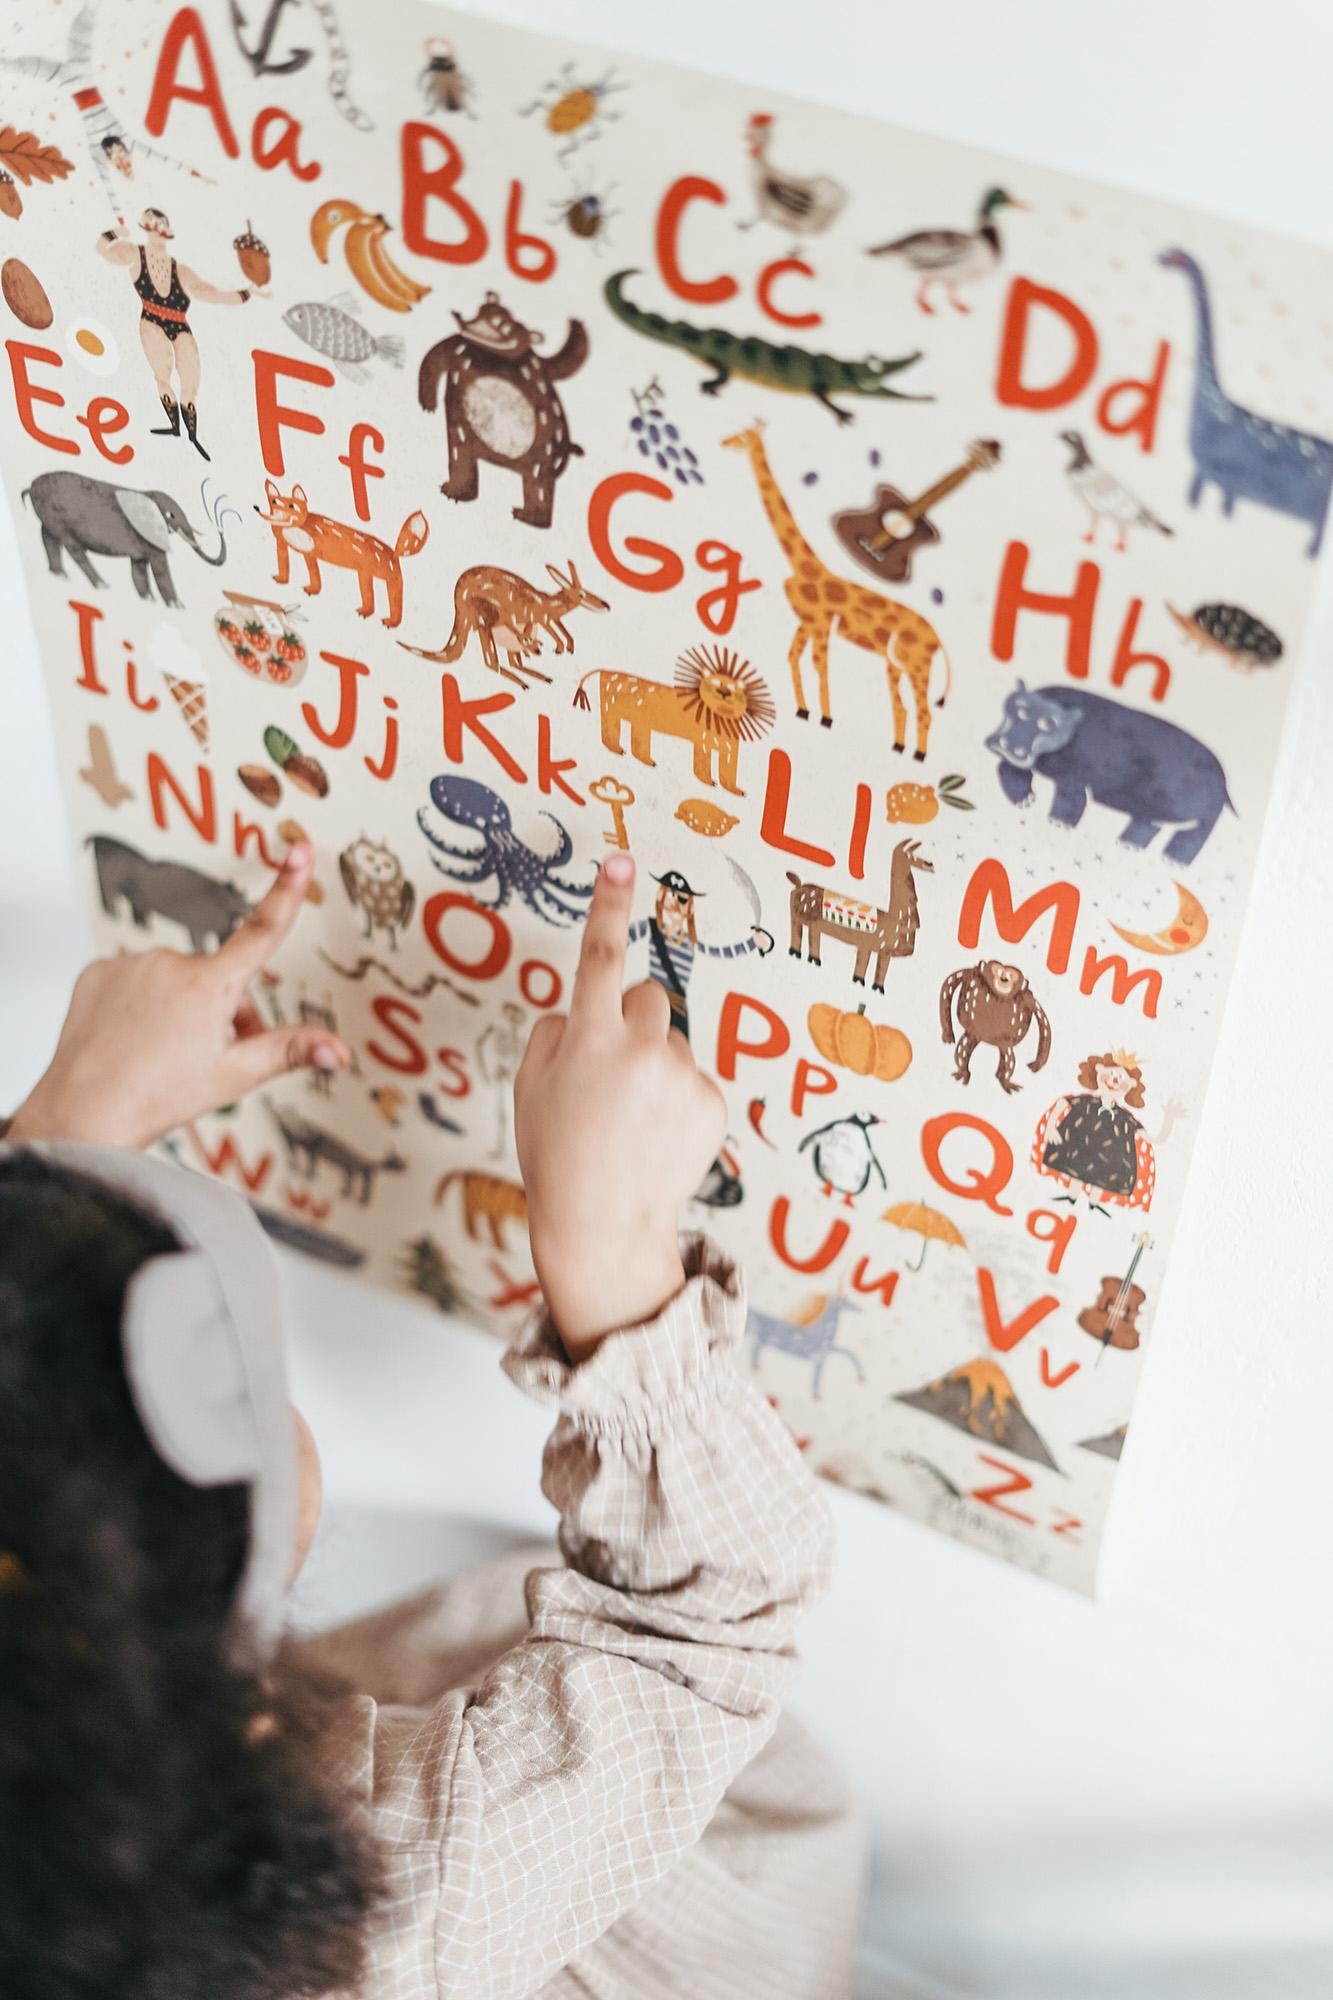 isolation activities for children, alphabet